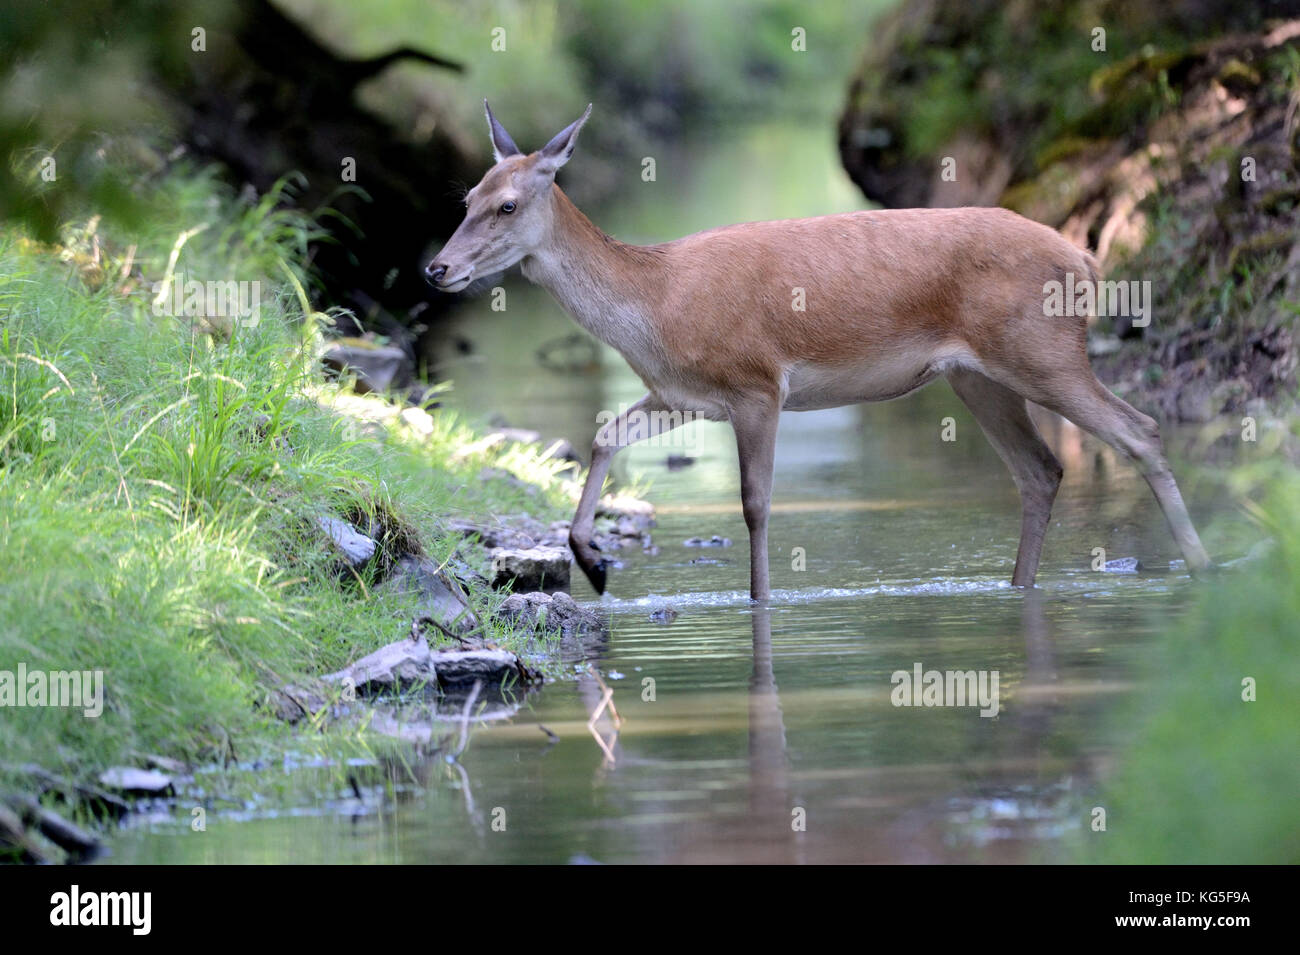 Red deer, Cervus elaphus, hind, brook, - Stock Image